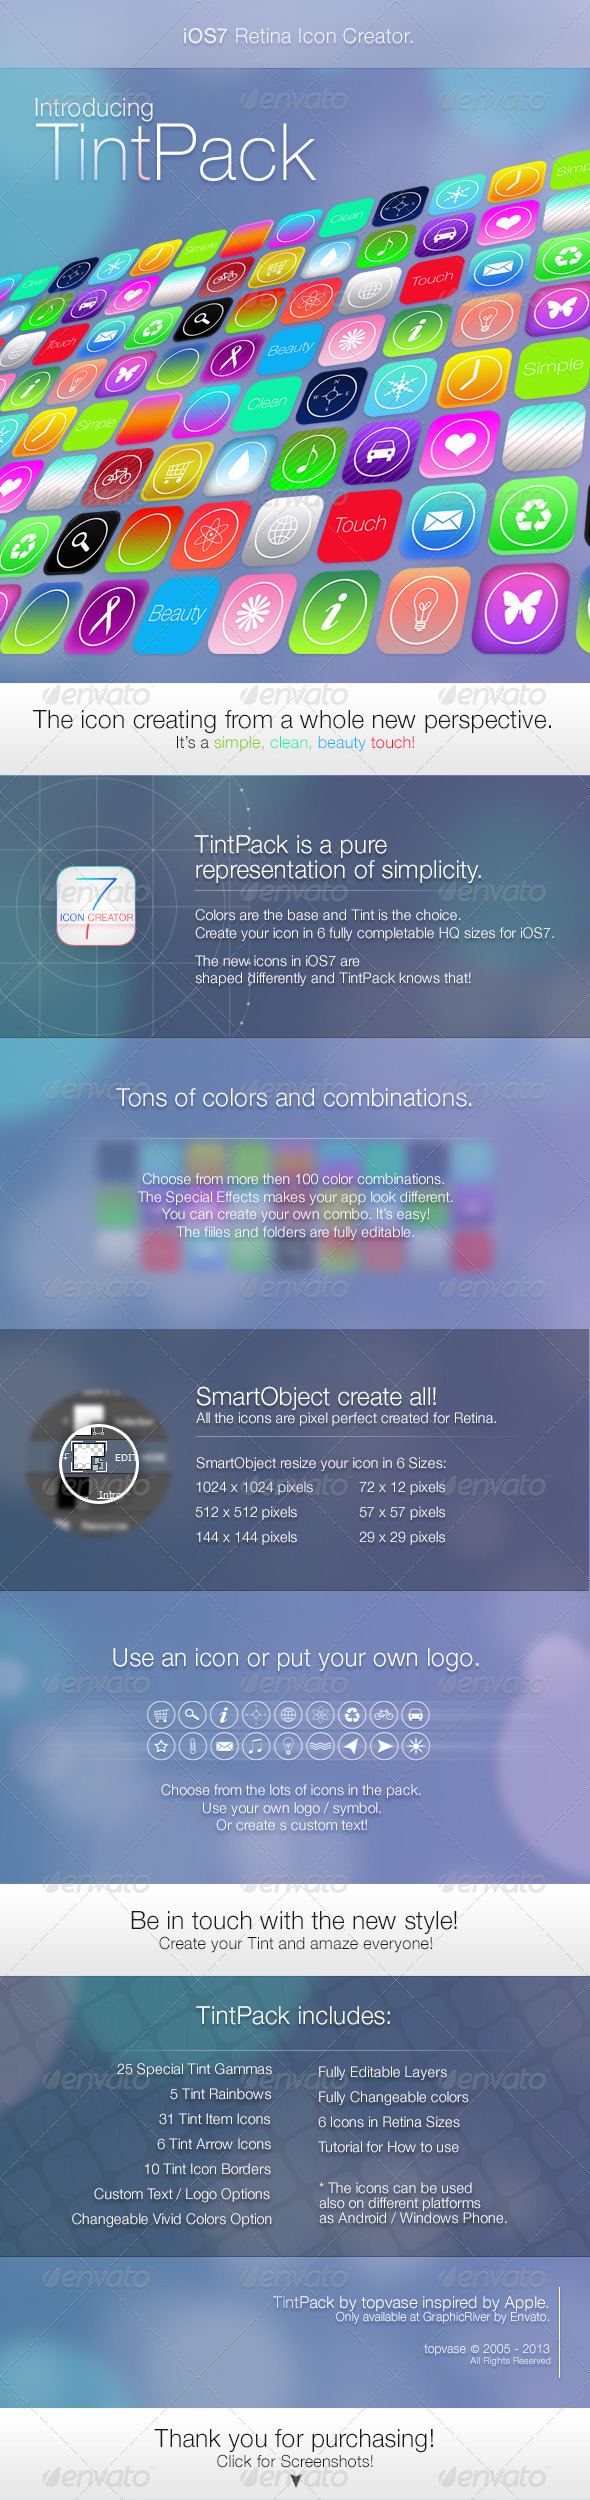 GraphicRiver iOS7 Retina Icon Creator TintPack 4978103